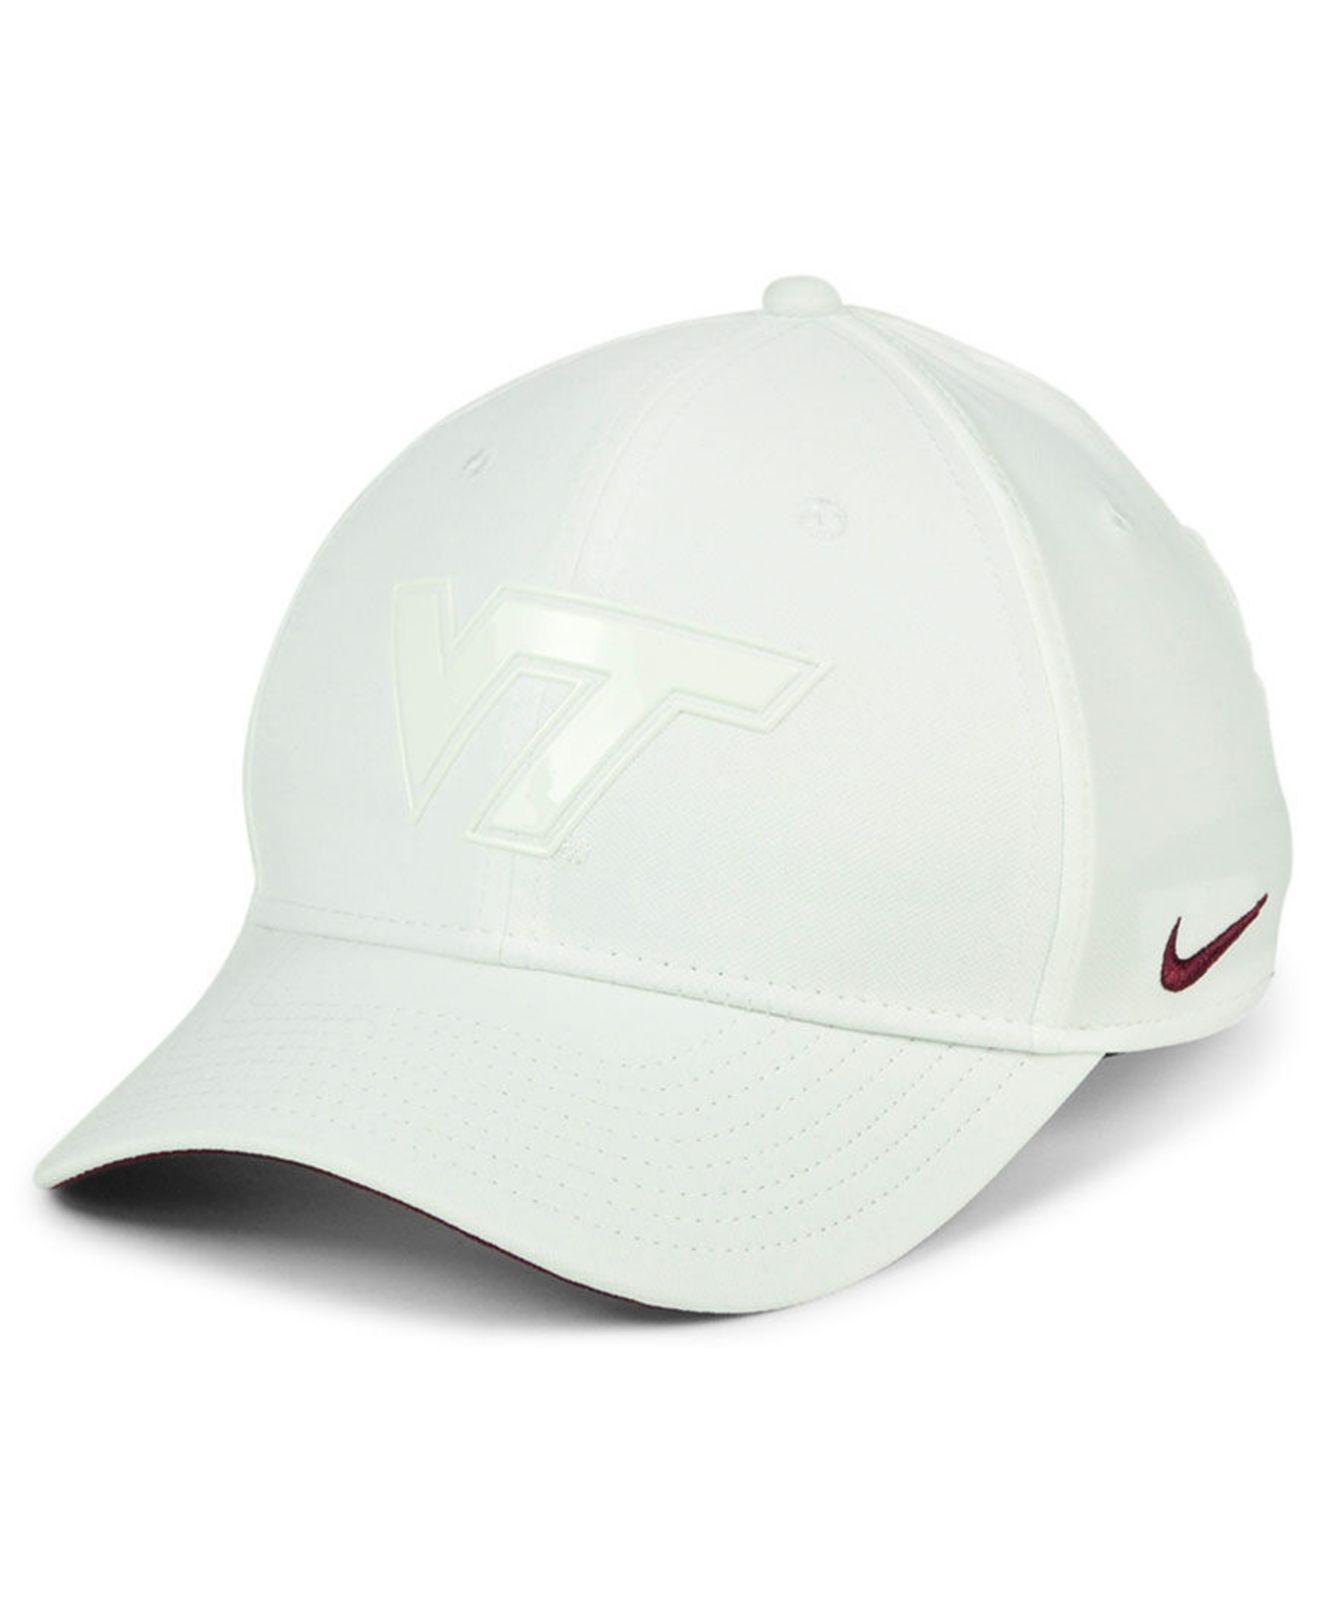 half off 1cca6 ff408 ... adjustable performance hat maroon white 9bd63 e339f  closeout nike. mens  white virginia tech hokies col cap 54698 a144e